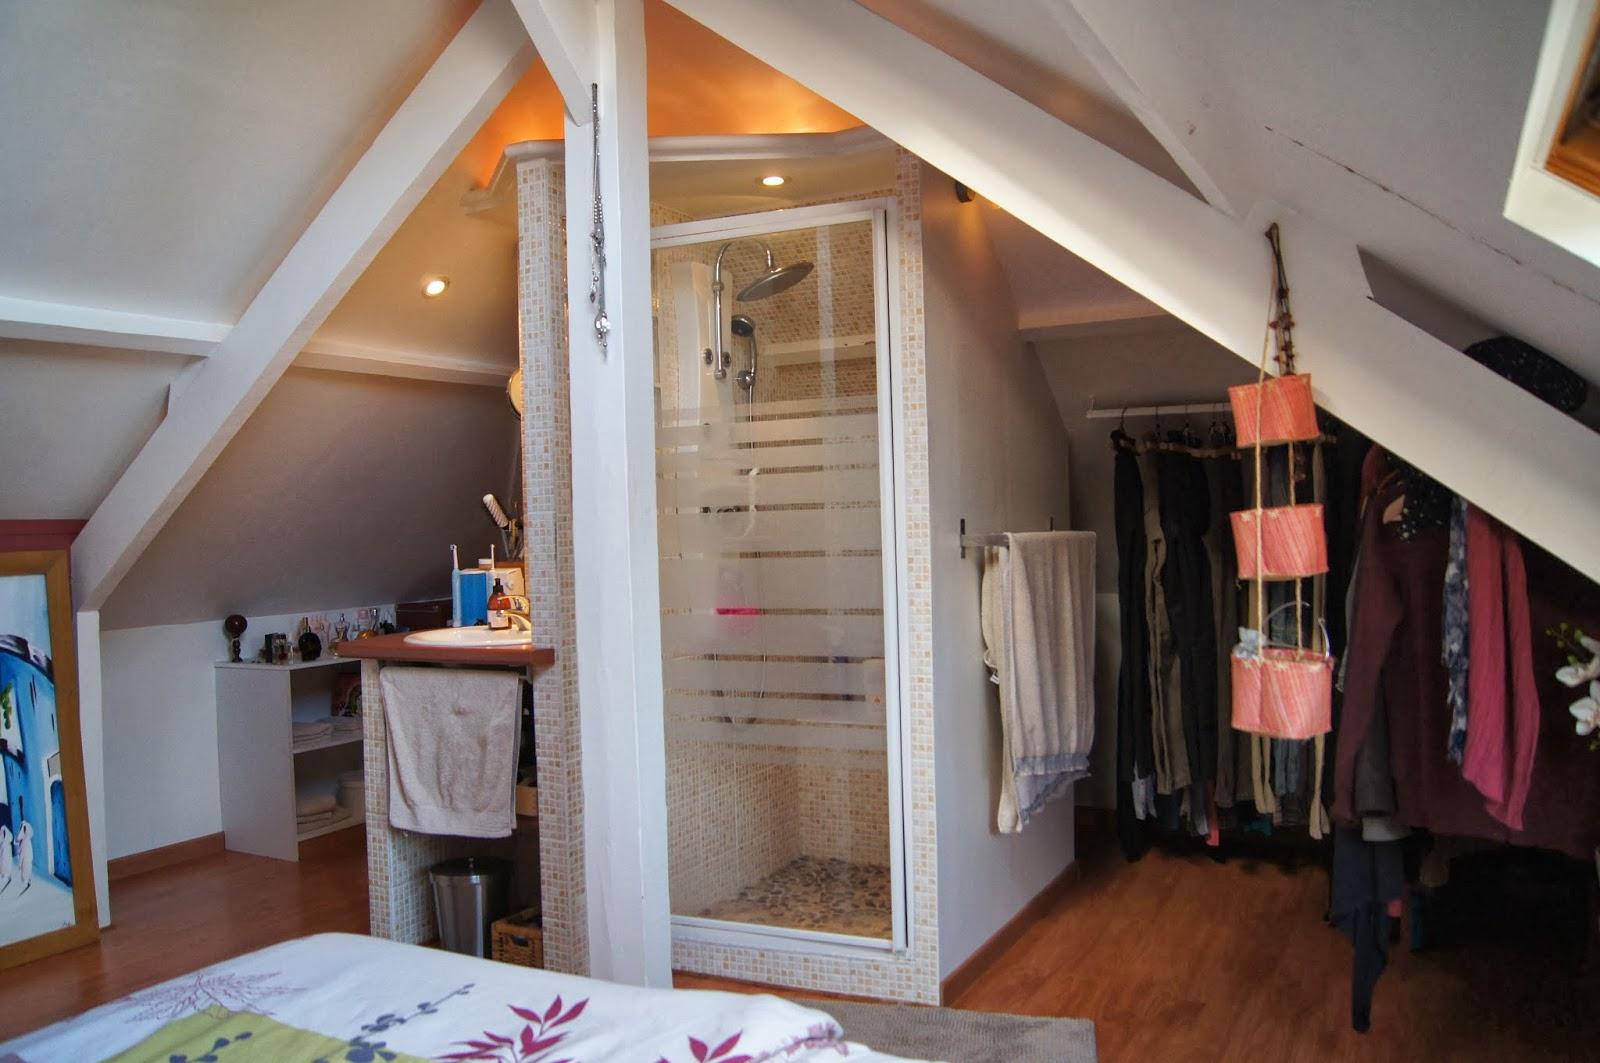 chambre avec salle de bain intgre petite chambre avec. Black Bedroom Furniture Sets. Home Design Ideas